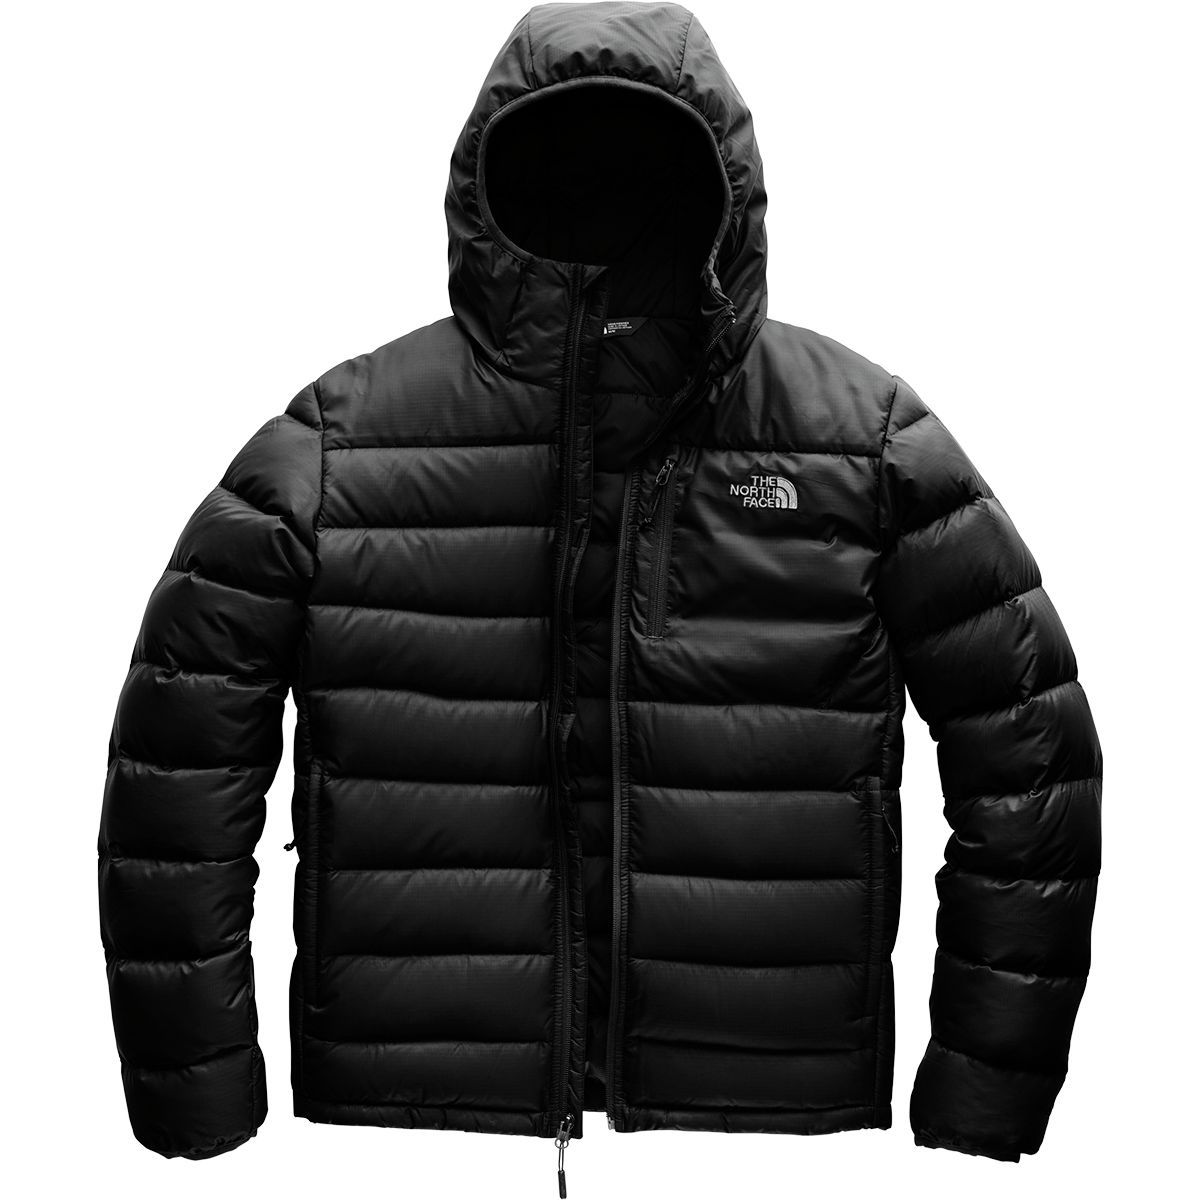 Aconcagua 2 Hooded Jacket Men S Hooded Jacket Men North Face Mens Mens Jackets [ 1200 x 1200 Pixel ]